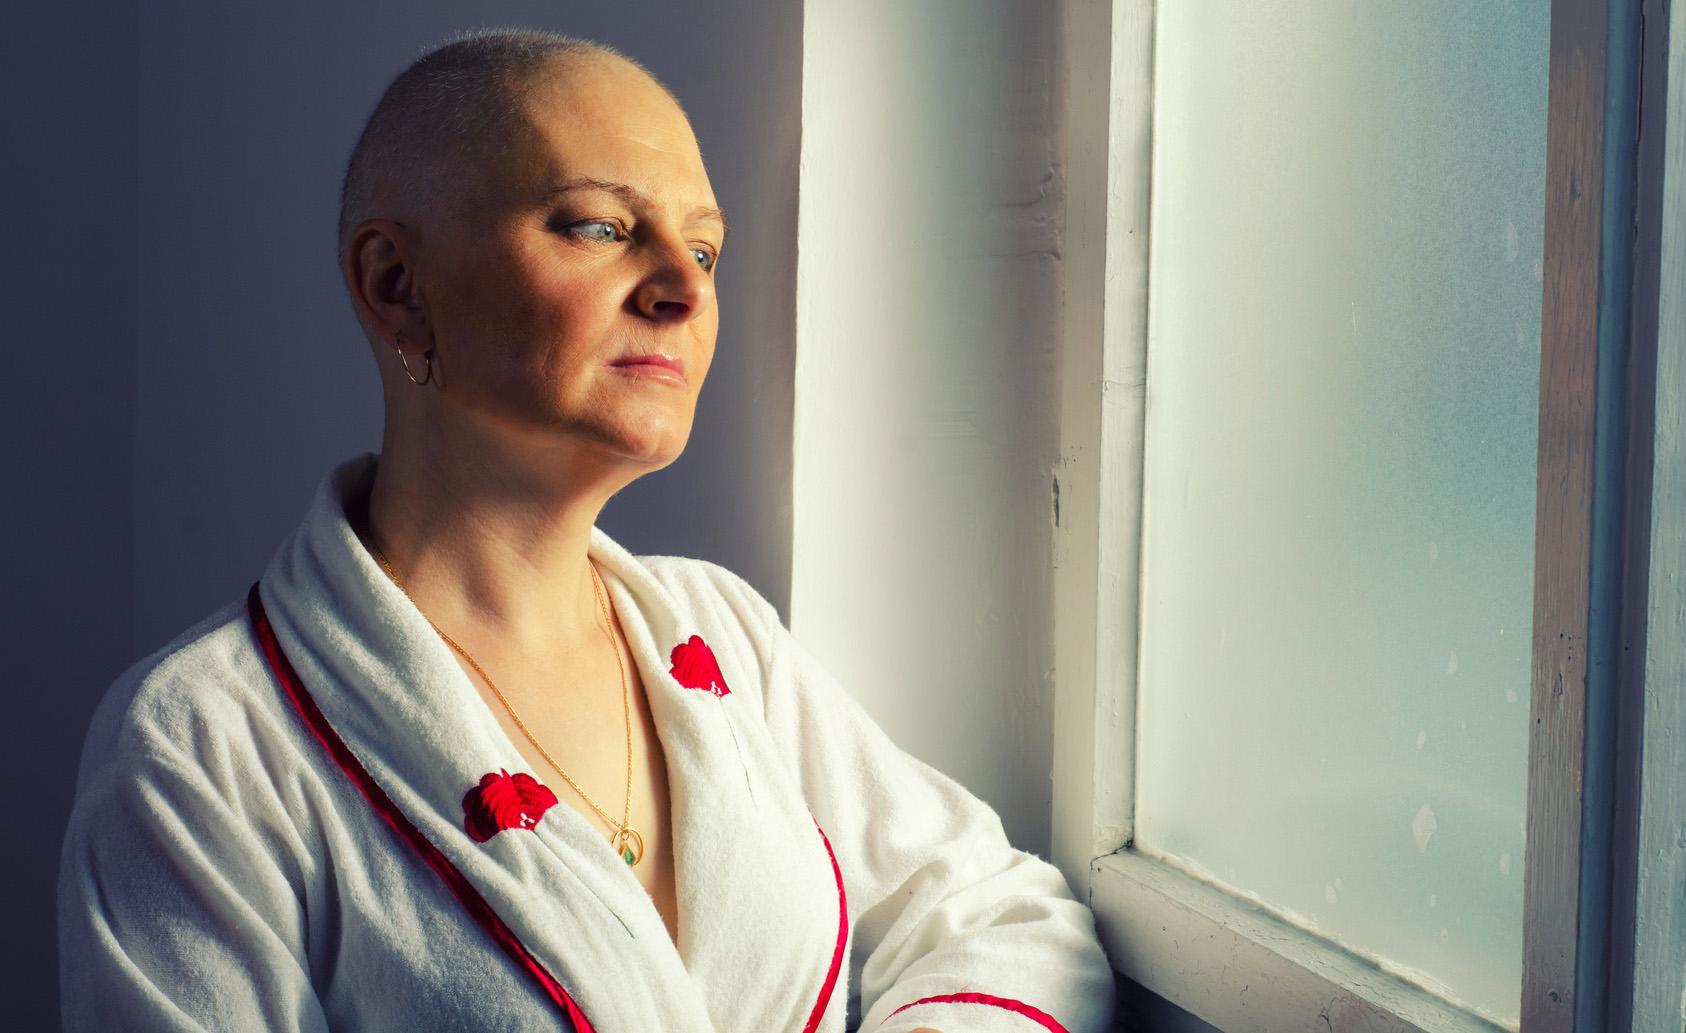 Perdida de peso to quimioterapia